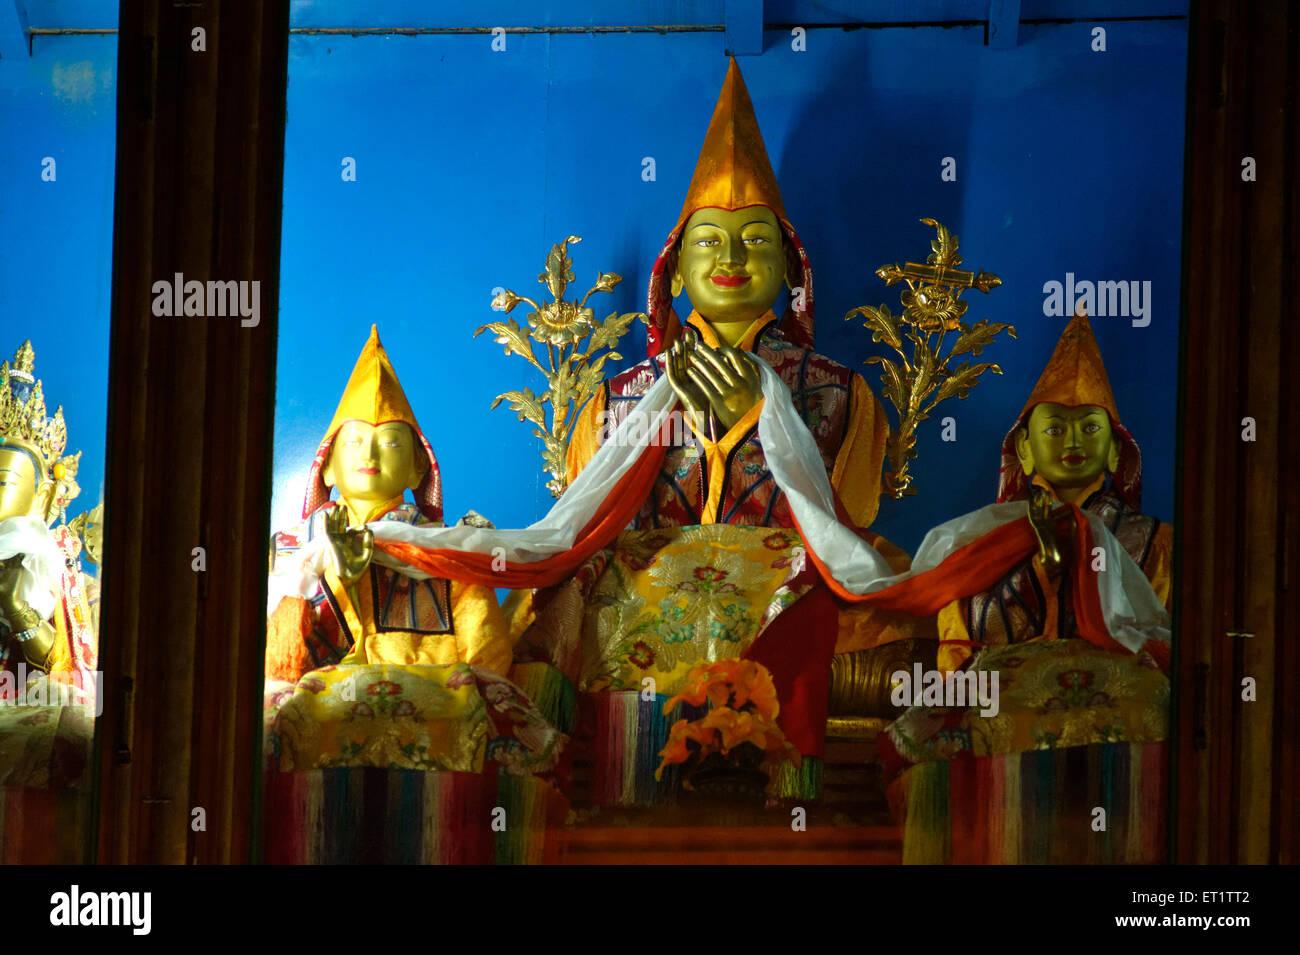 Idols at Shar Gaden Monastery in Mundgod at Karnataka India - Stock Image